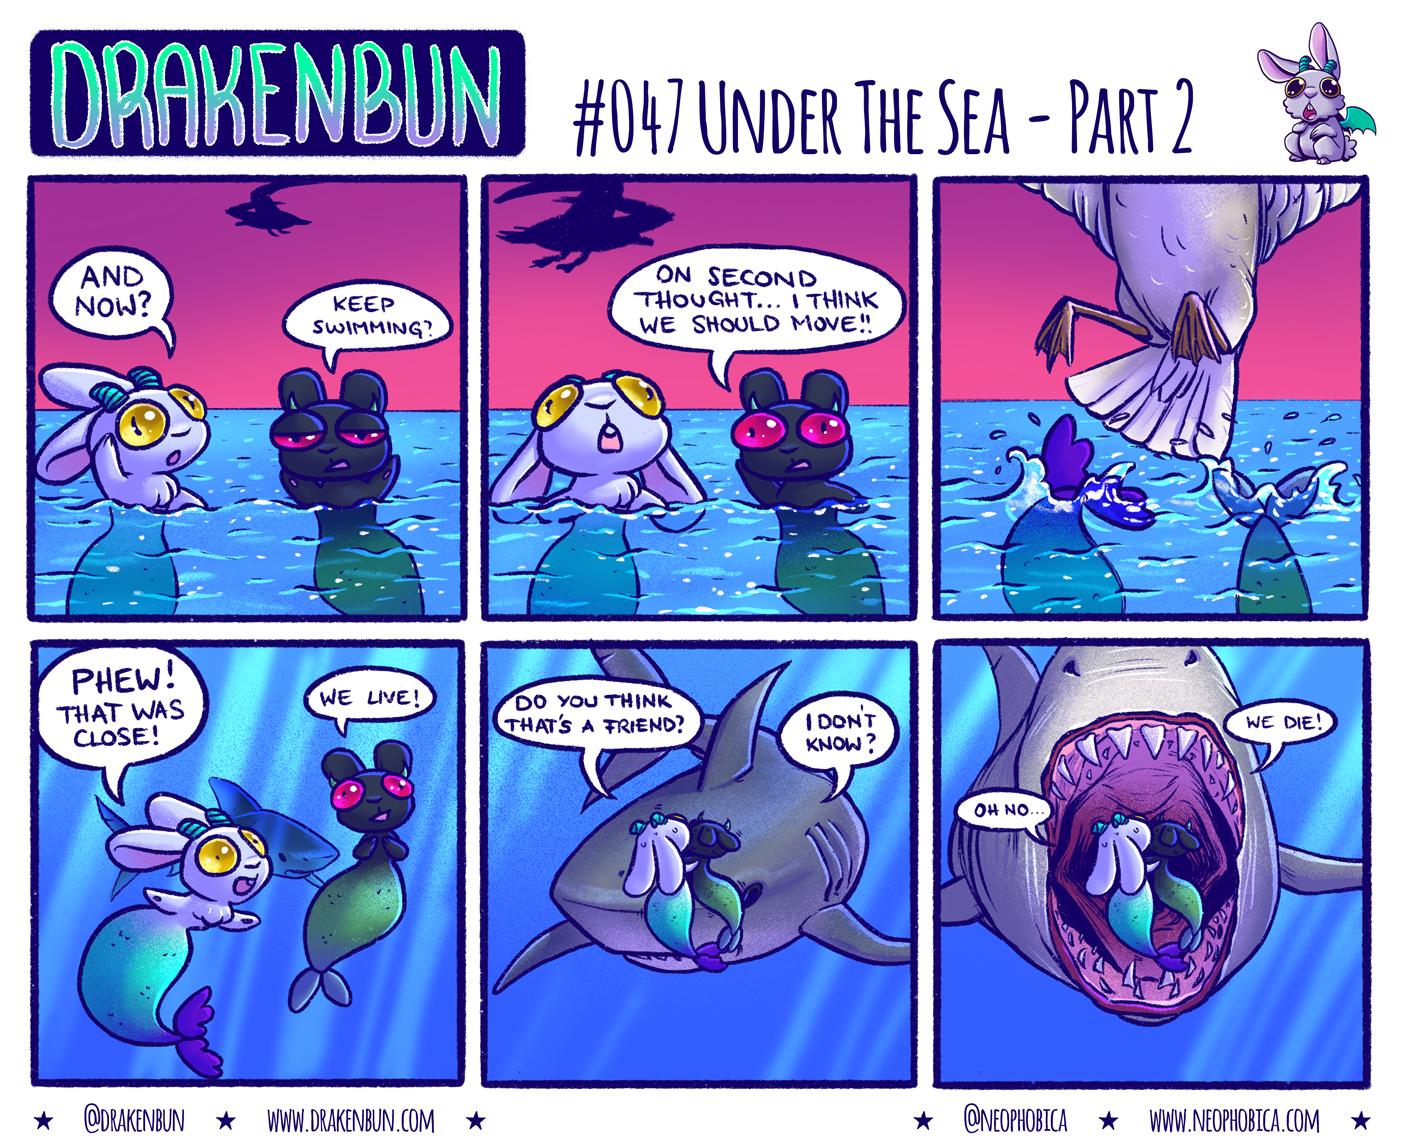 #047 Under The Sea – Part 2